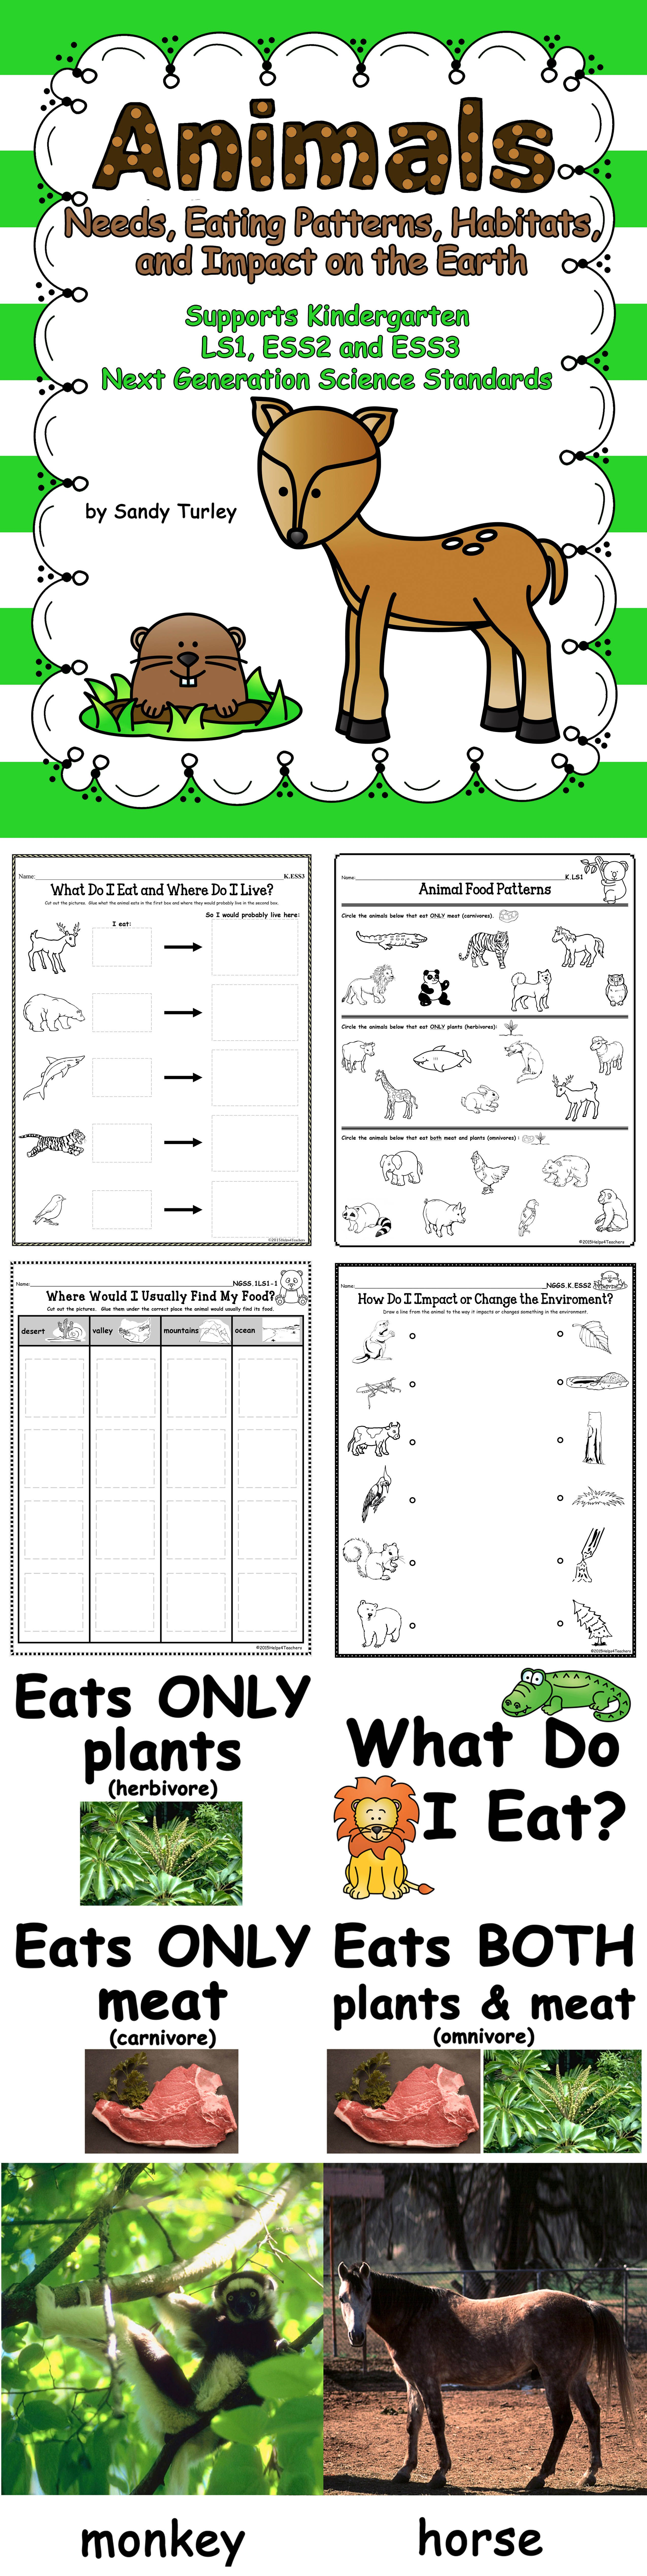 Ngss Kindergarten Ess 2 Amp 3 Animals Needs Patterns